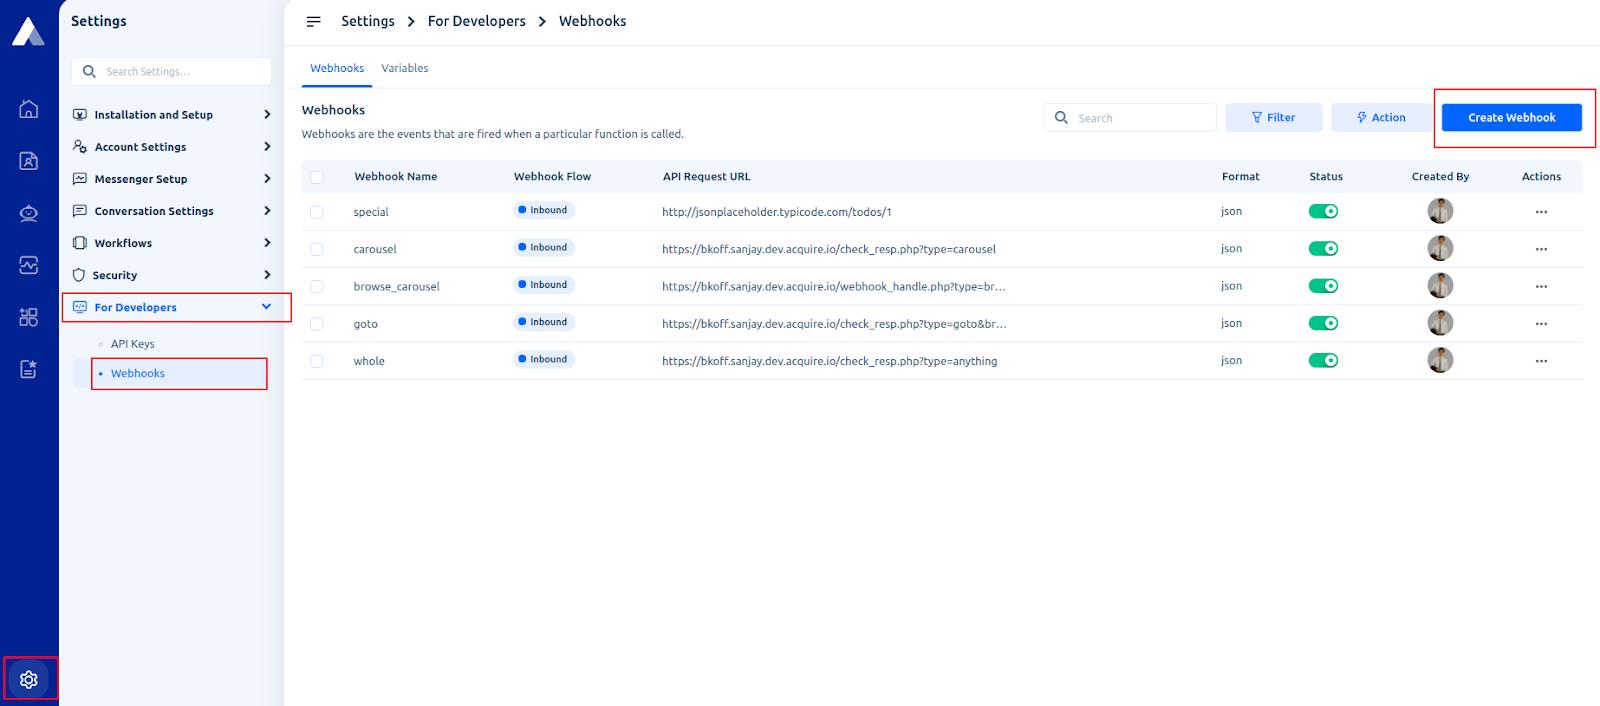 webhooks-menu-096bc3bd6cb8ed976d8d7176.png